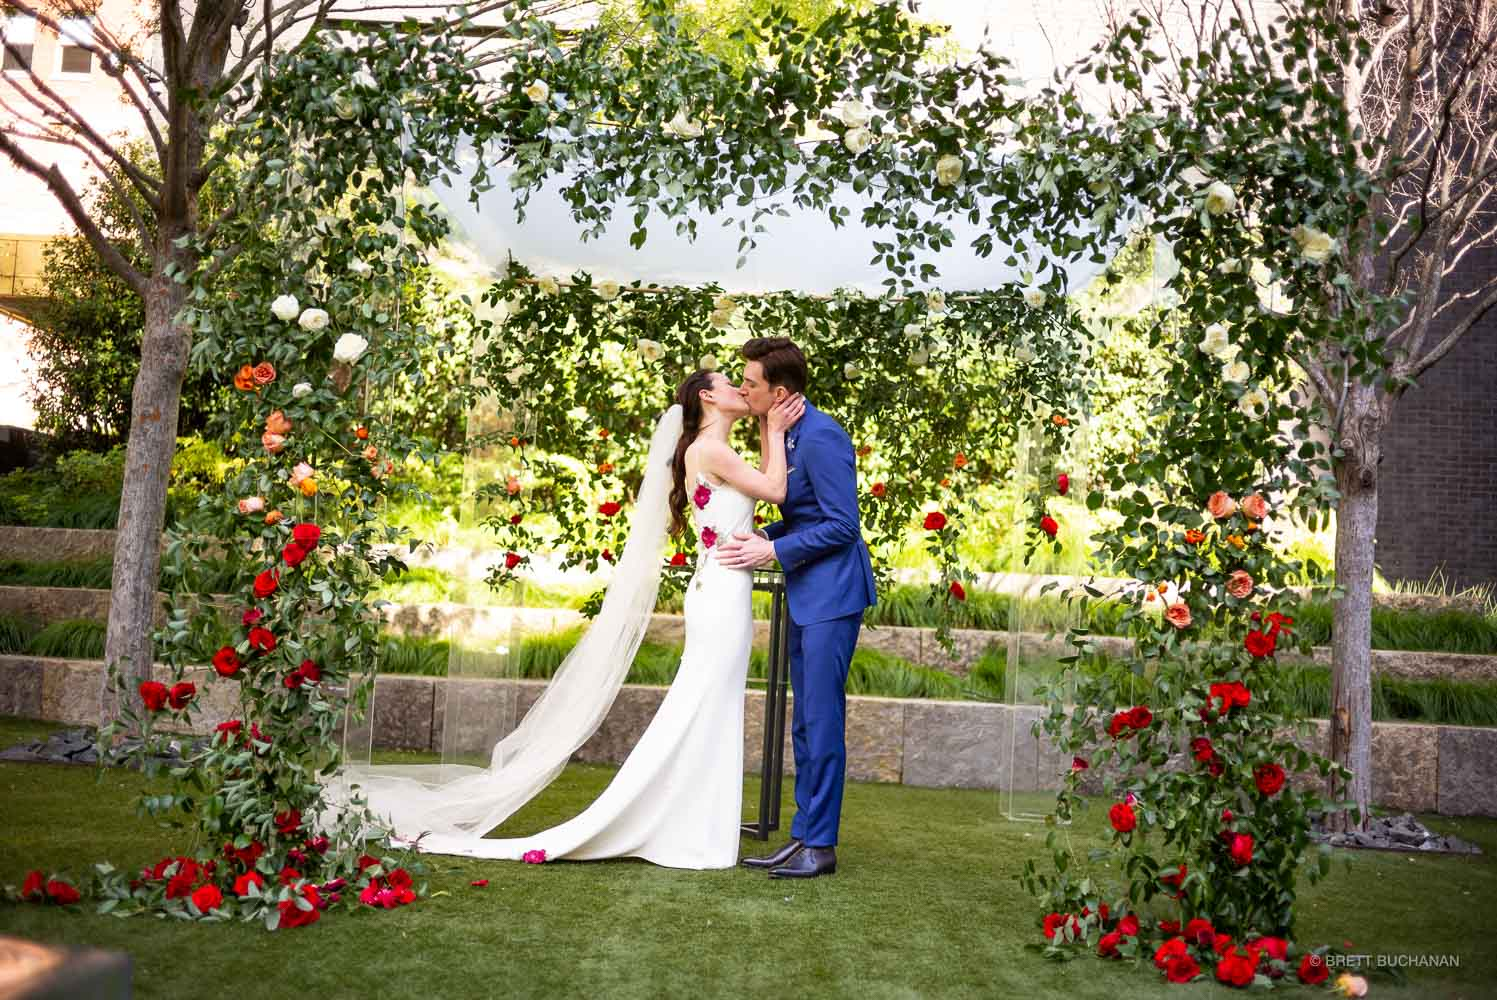 Austin-wedding-photographer-dallas-eyeball-joule-45